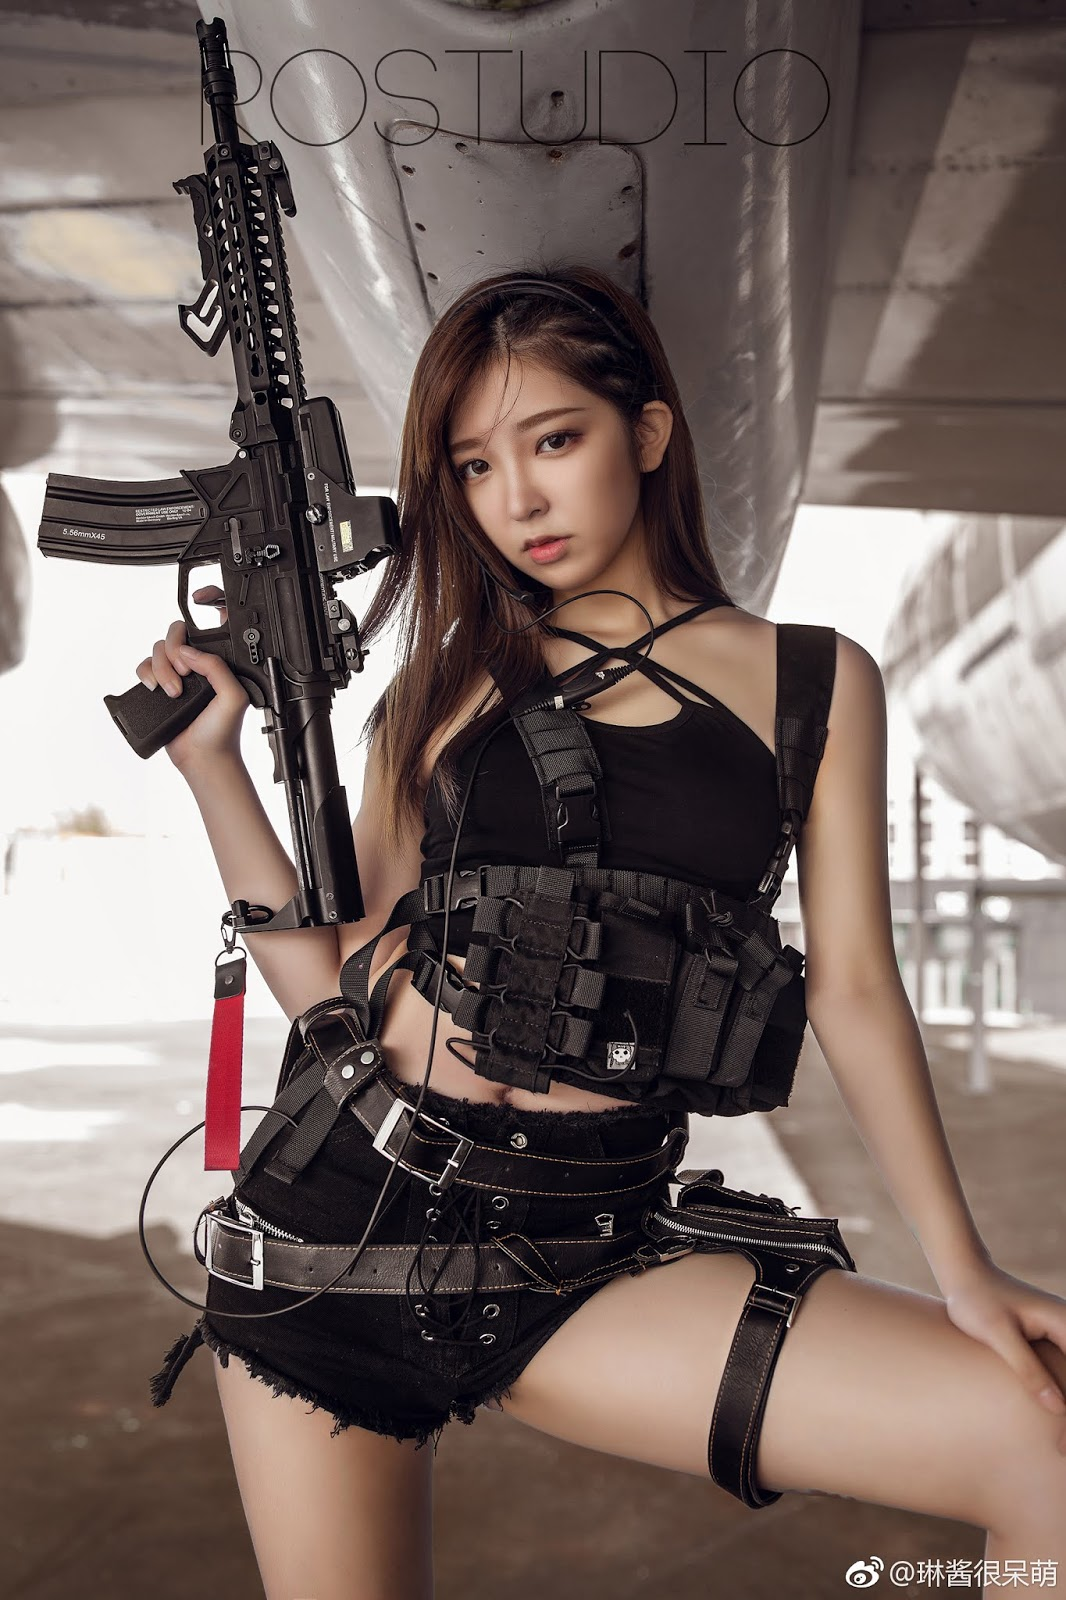 Asian girl gun movie